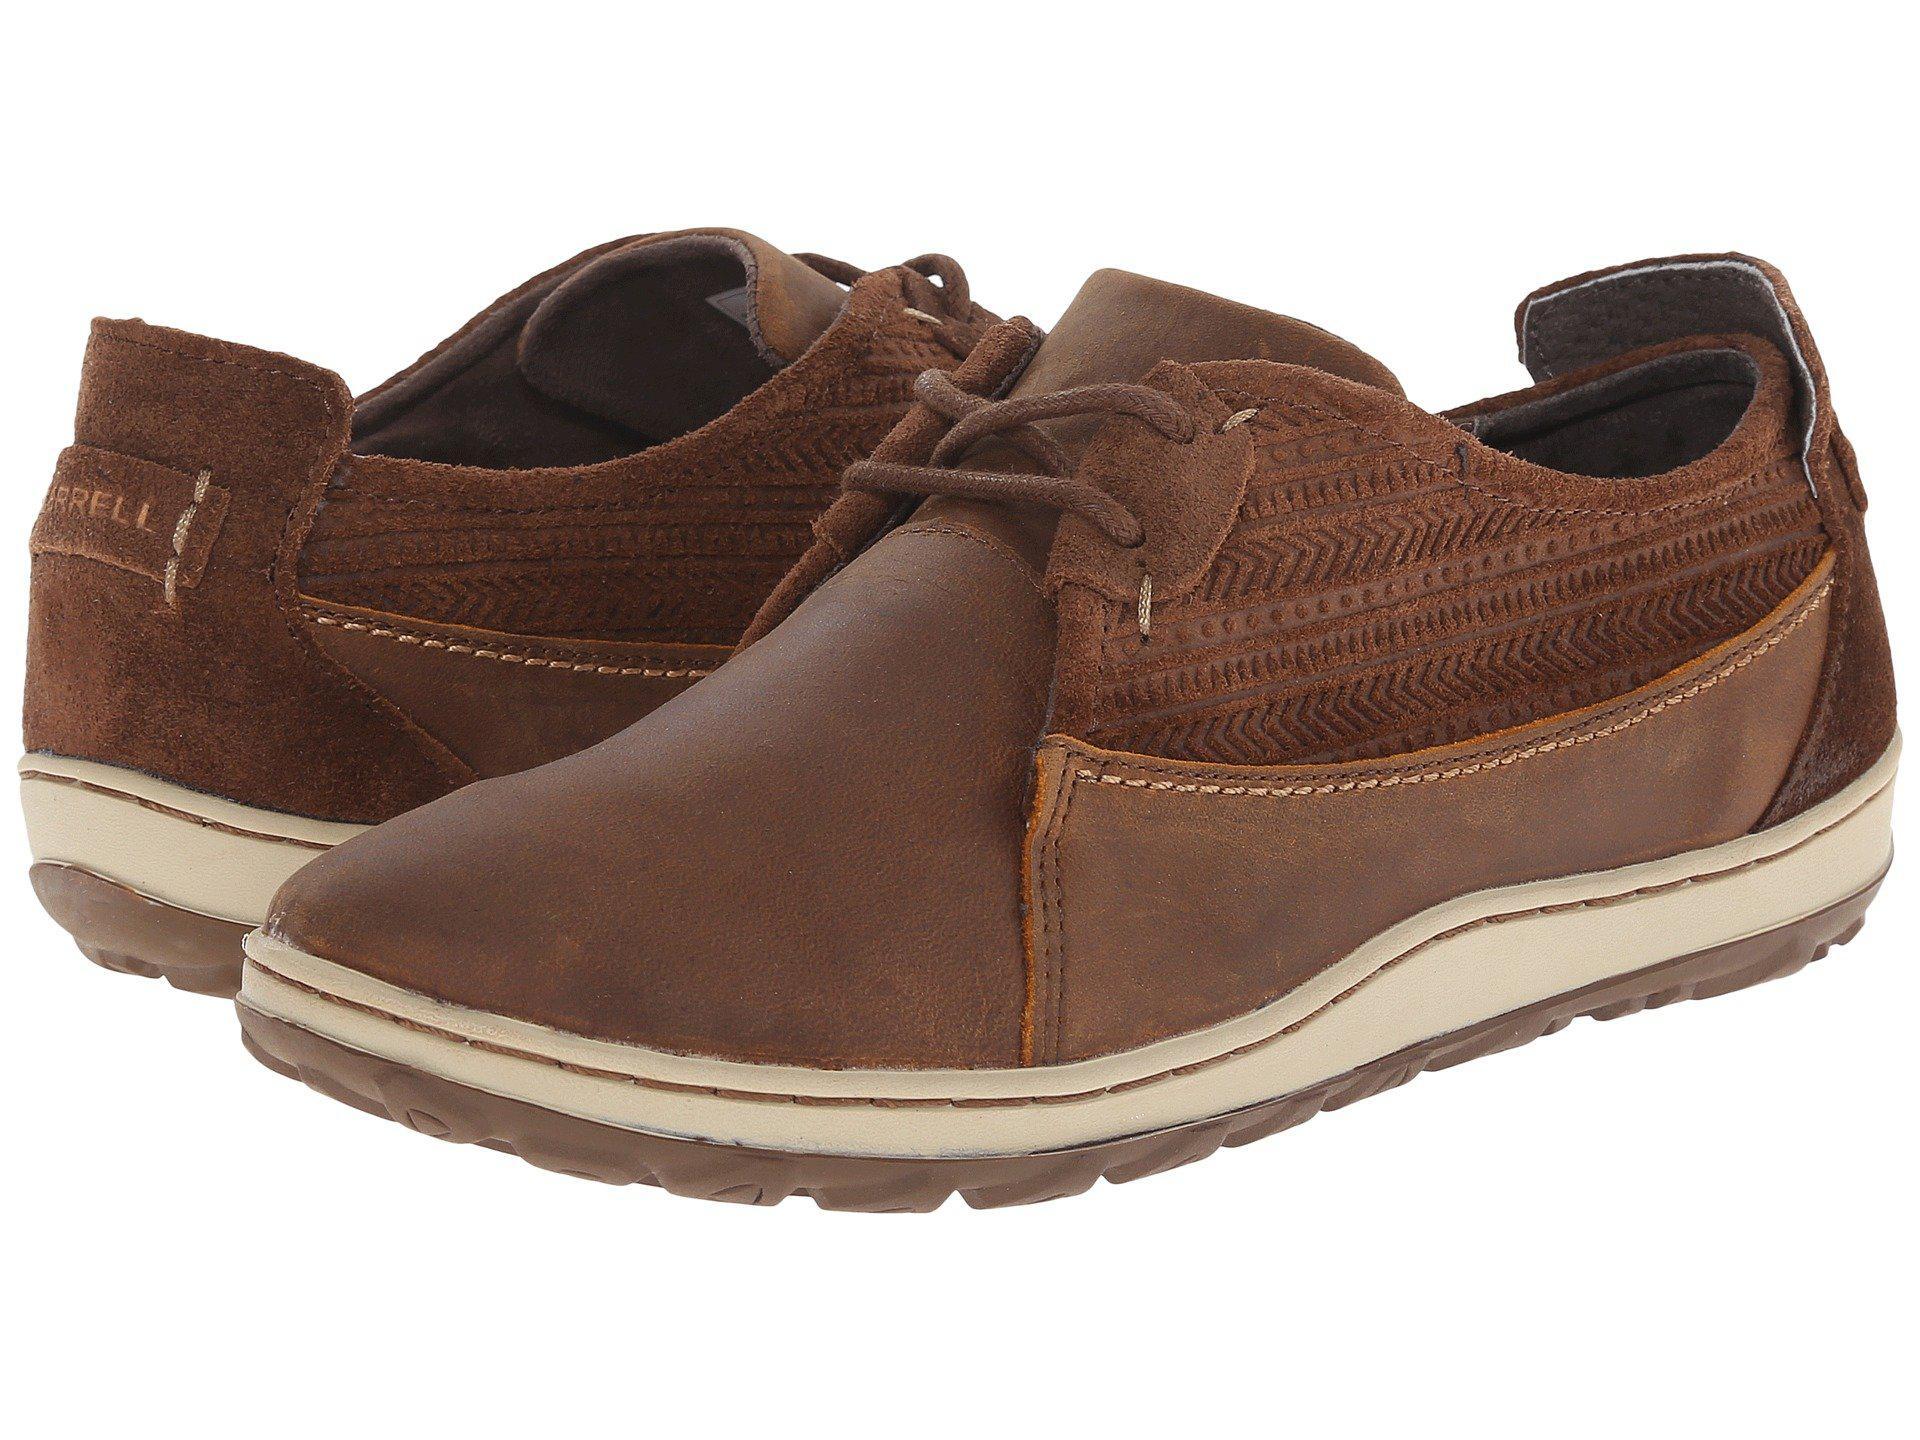 f6c1a409de4b Lyst - Merrell Ashland Tie in Brown for Men